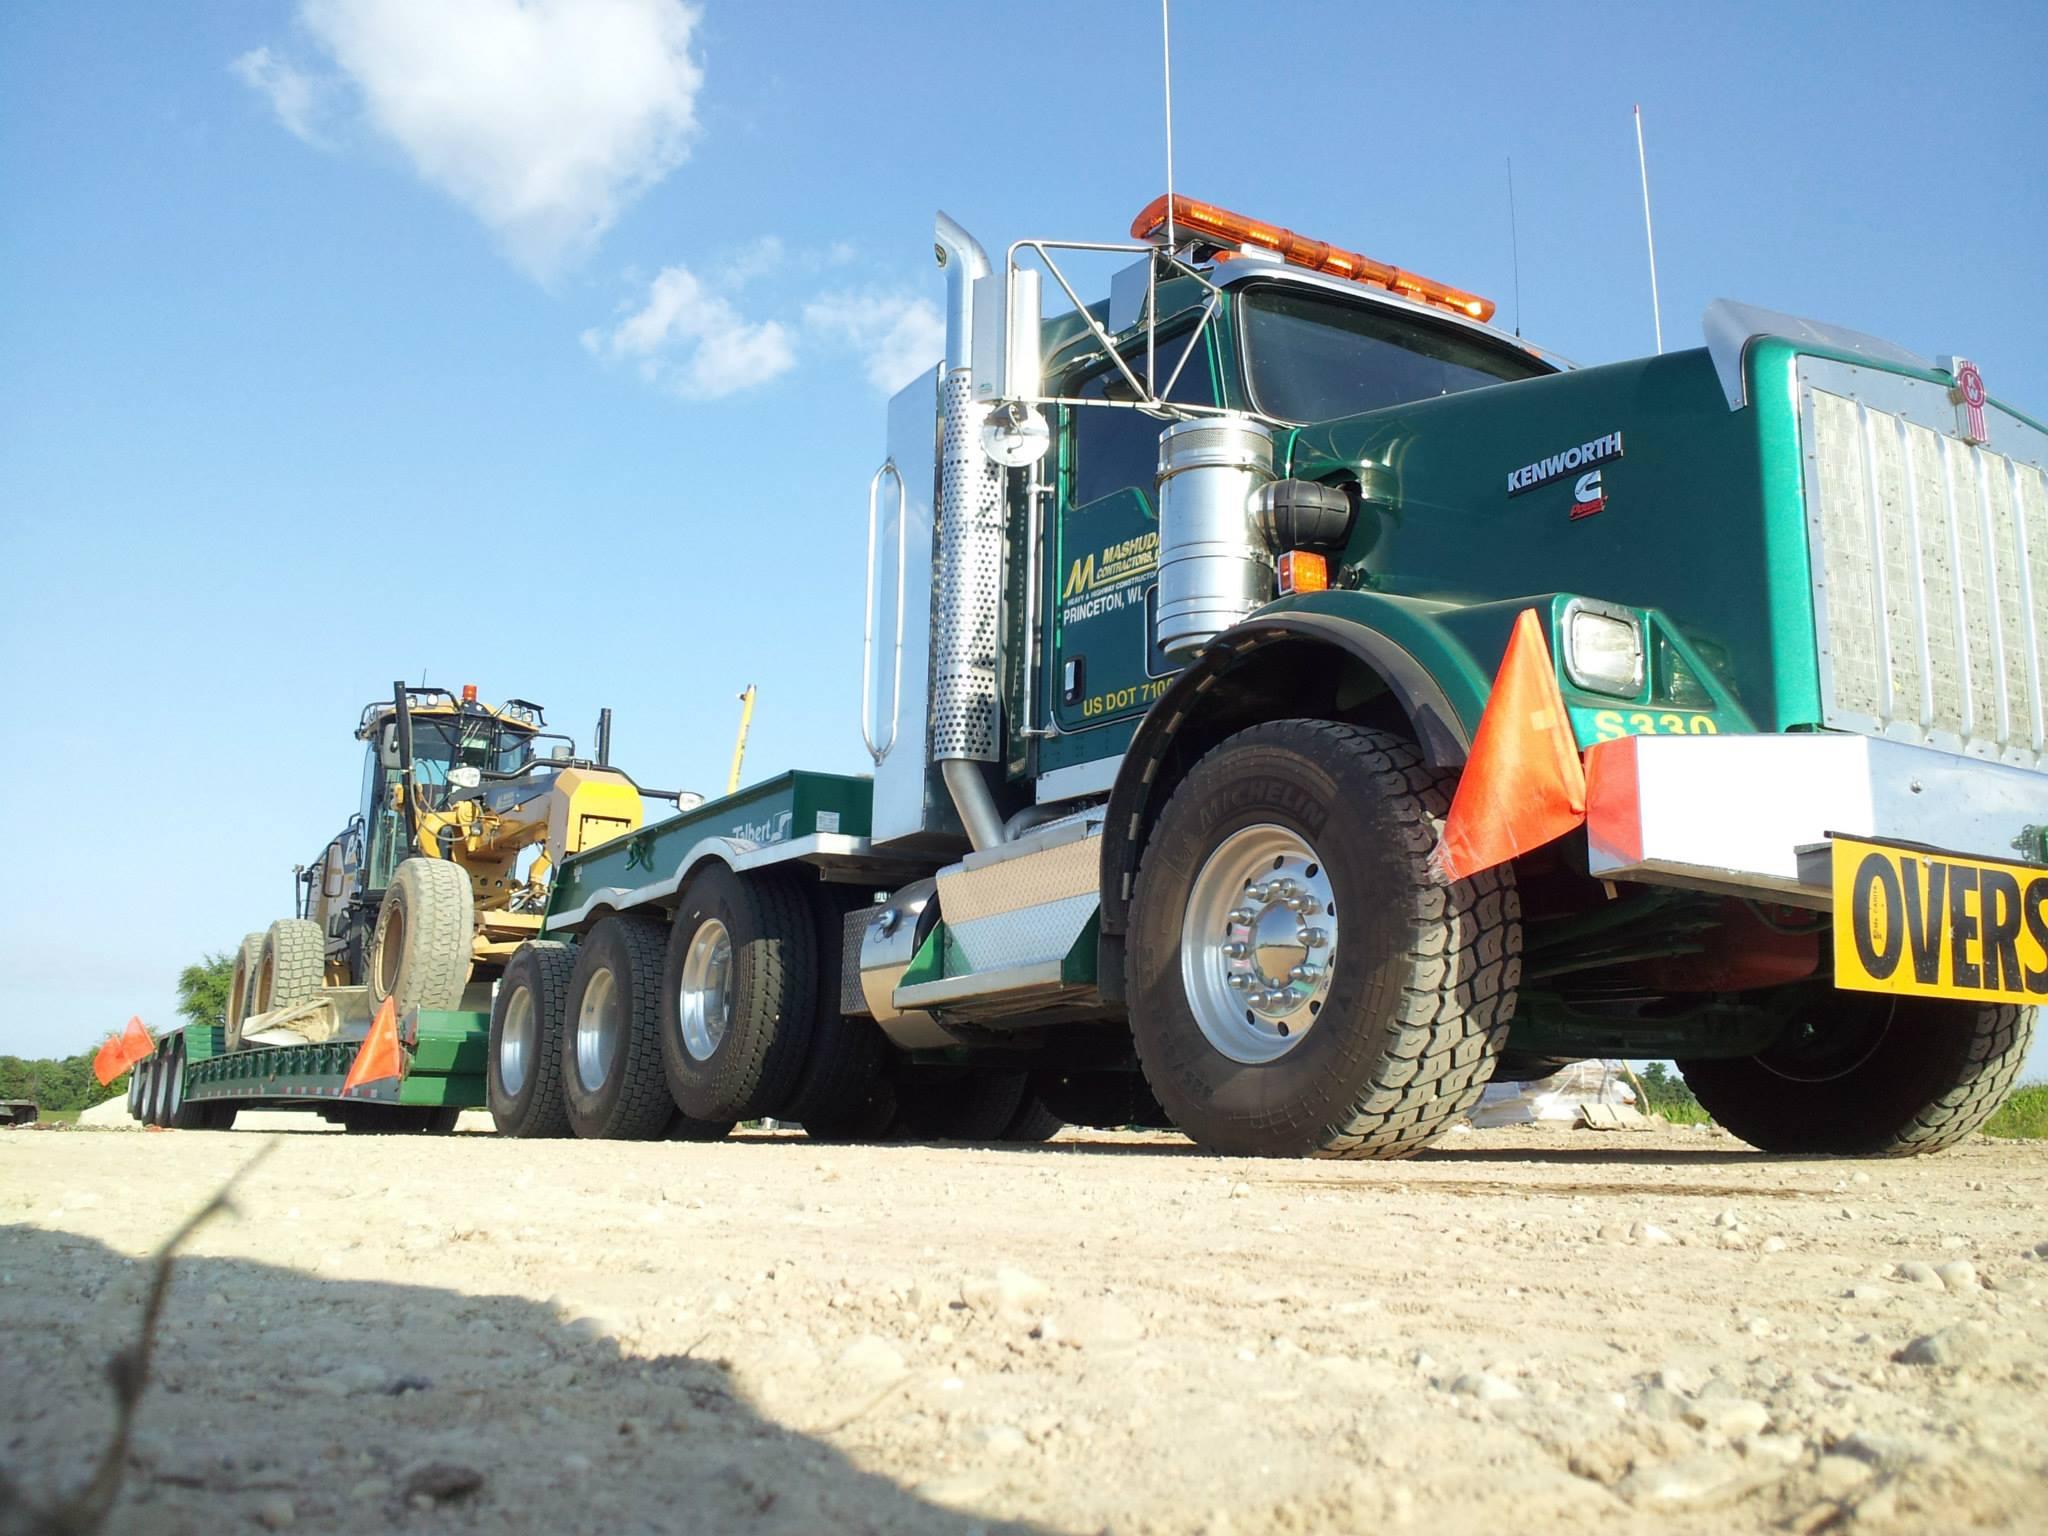 Kenworth Semi-Tractor